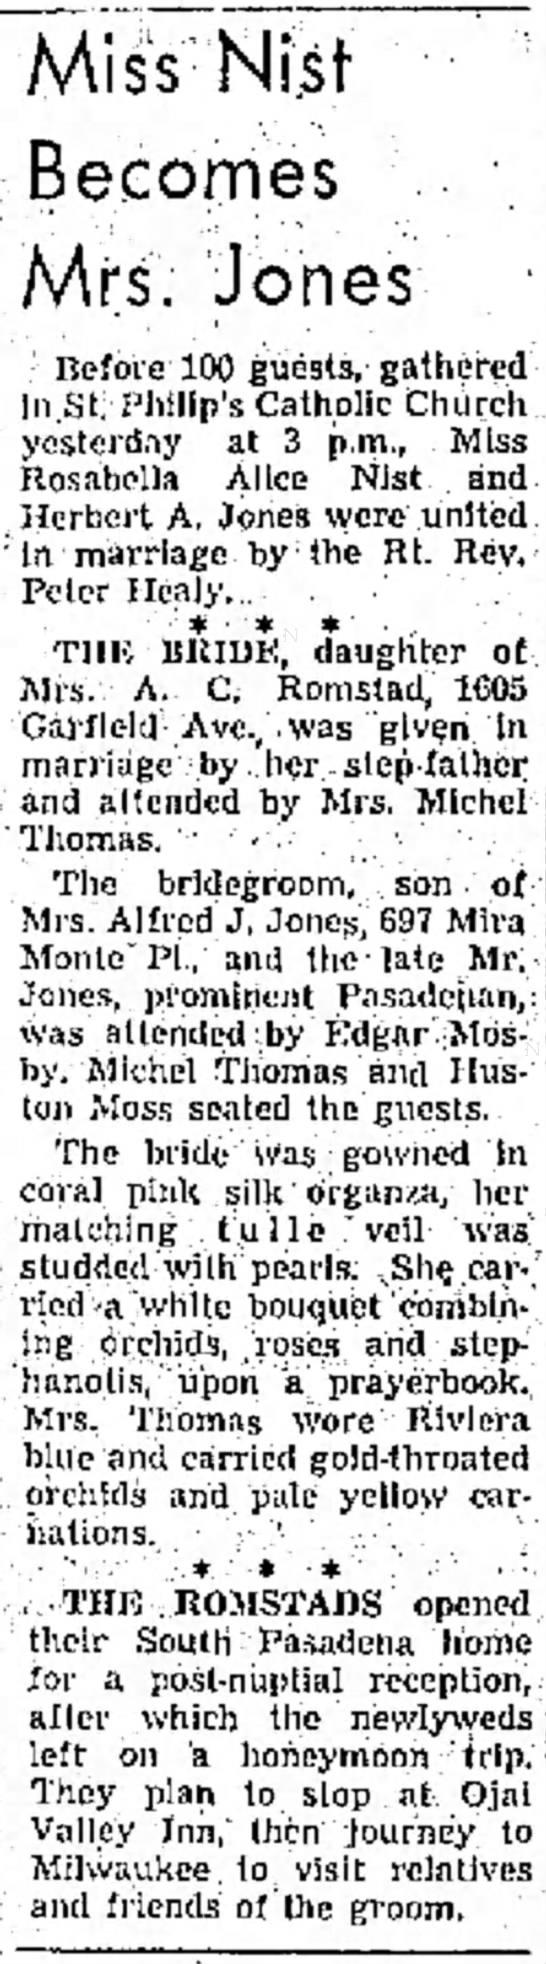 Rosabella Alice Nist wedding announcement, Independent Star-News, Pasadena, CA, June 8, 1958 -